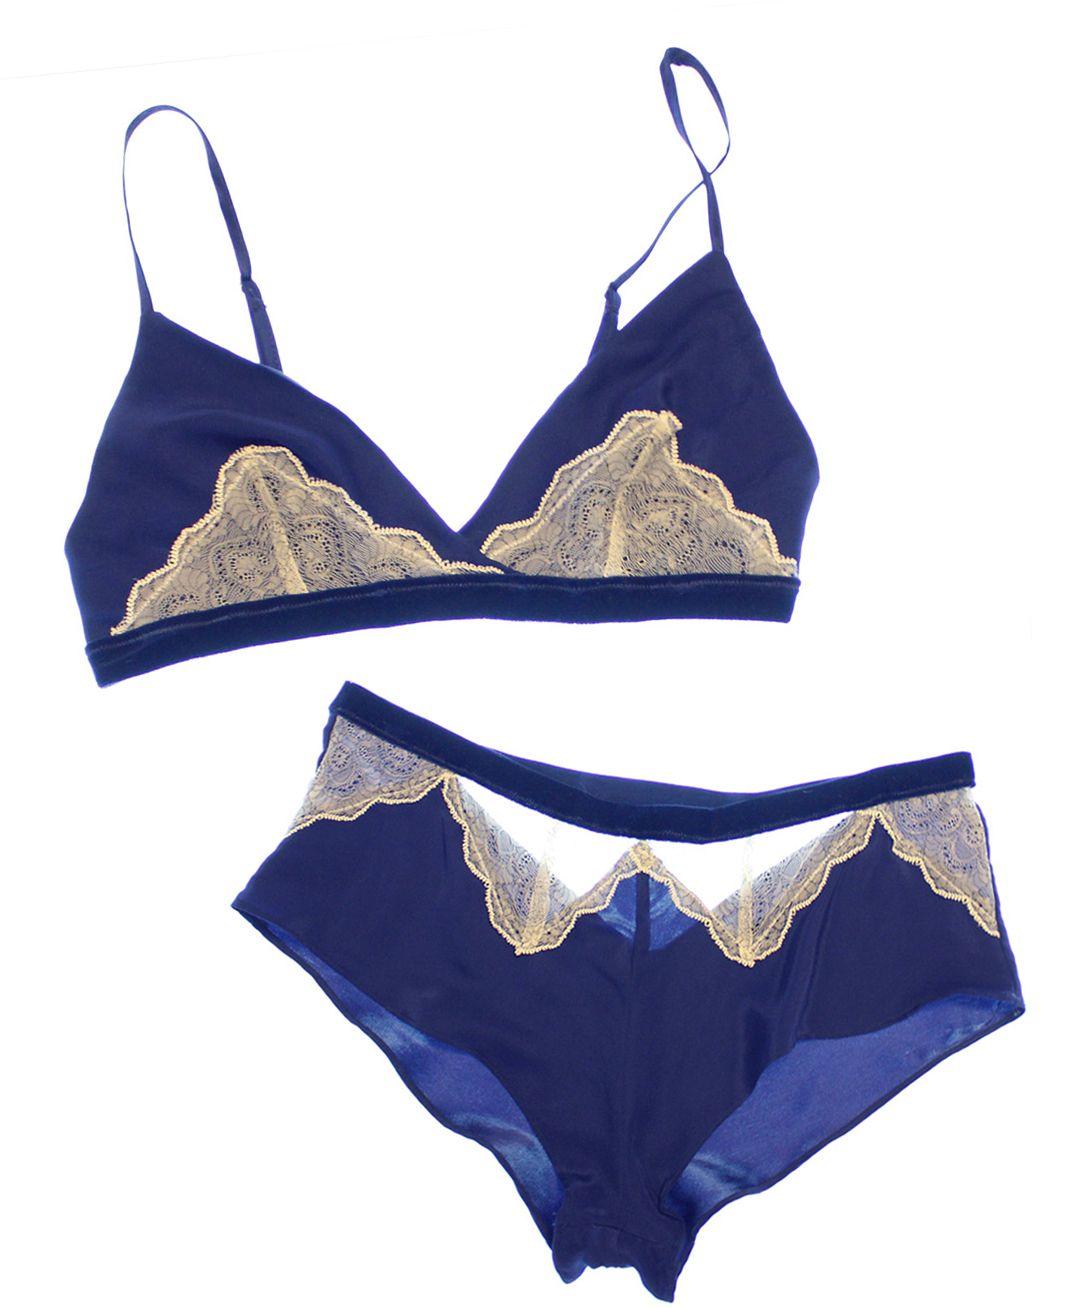 Between the Sheets Arabesque Cotton Silk/Lace Bralette & Ouvert Tap Pant - love the rich royal blue colour with cotton lace - reminds me of a vintage hanky!